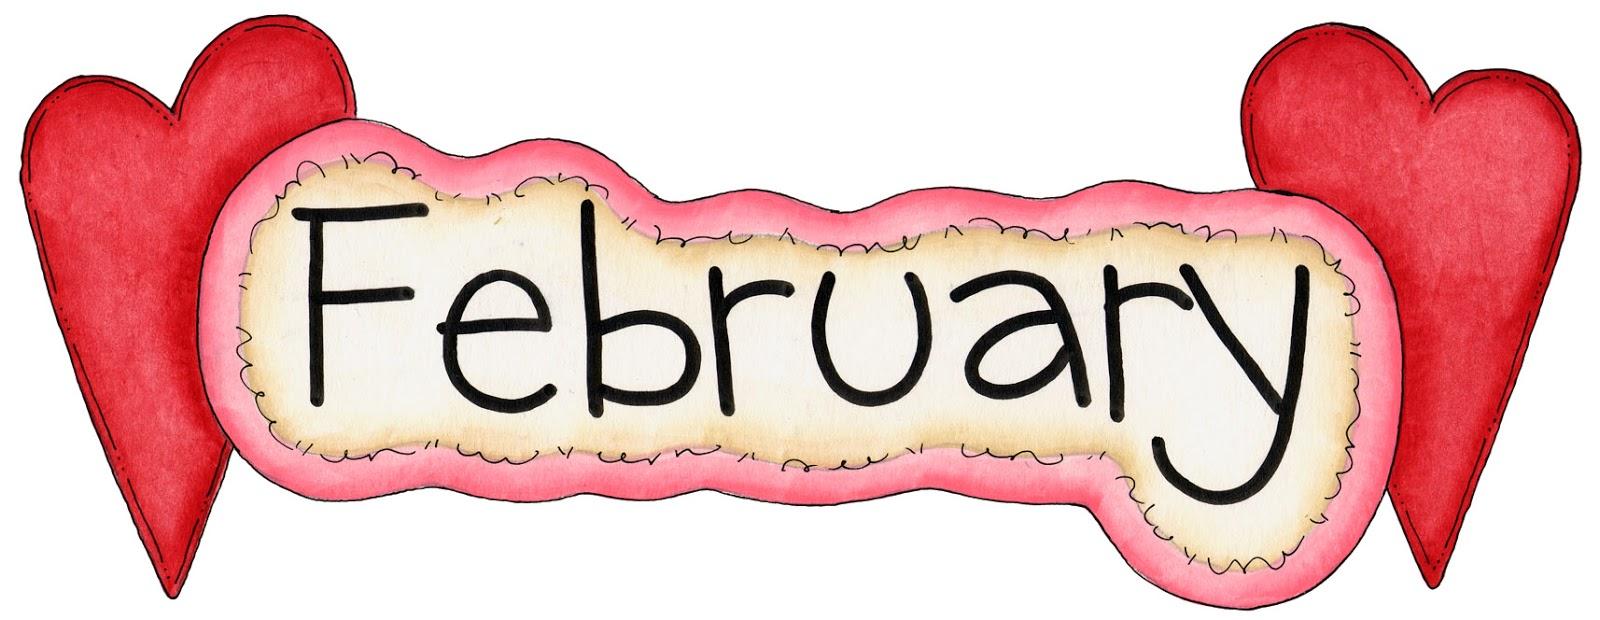 February calendar clip art jpg freeuse February calendar clipart - ClipartFest jpg freeuse